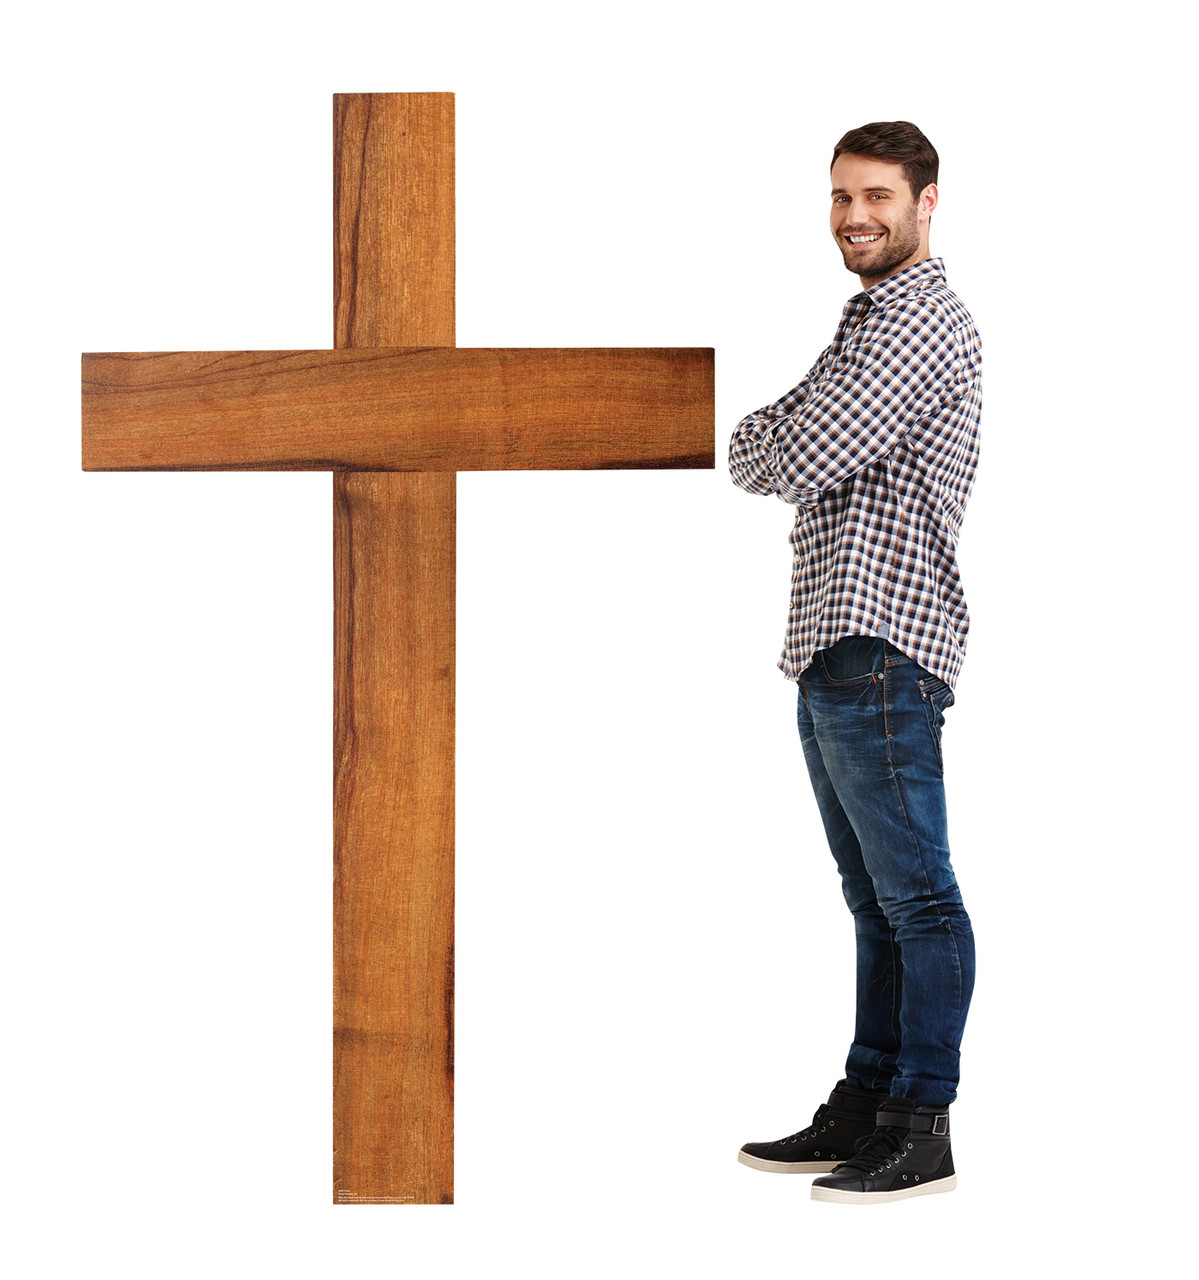 Life-size cardboard standee of a Cross Lifesize